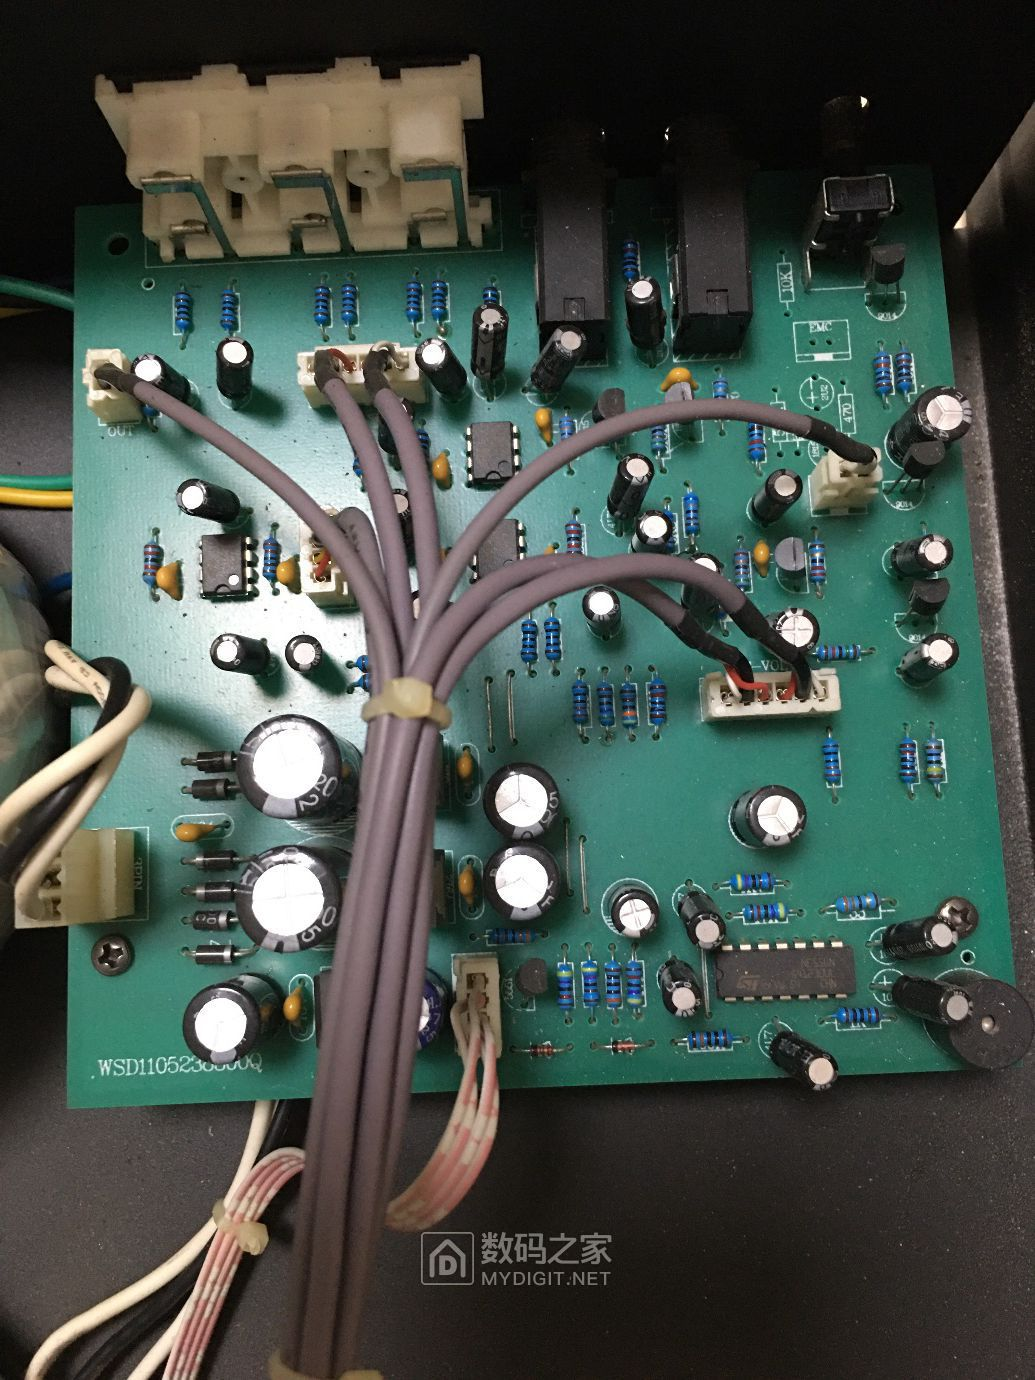 F0D6B6EB-EED1-4CC8-B60B-D2F9B2EEF606.jpeg